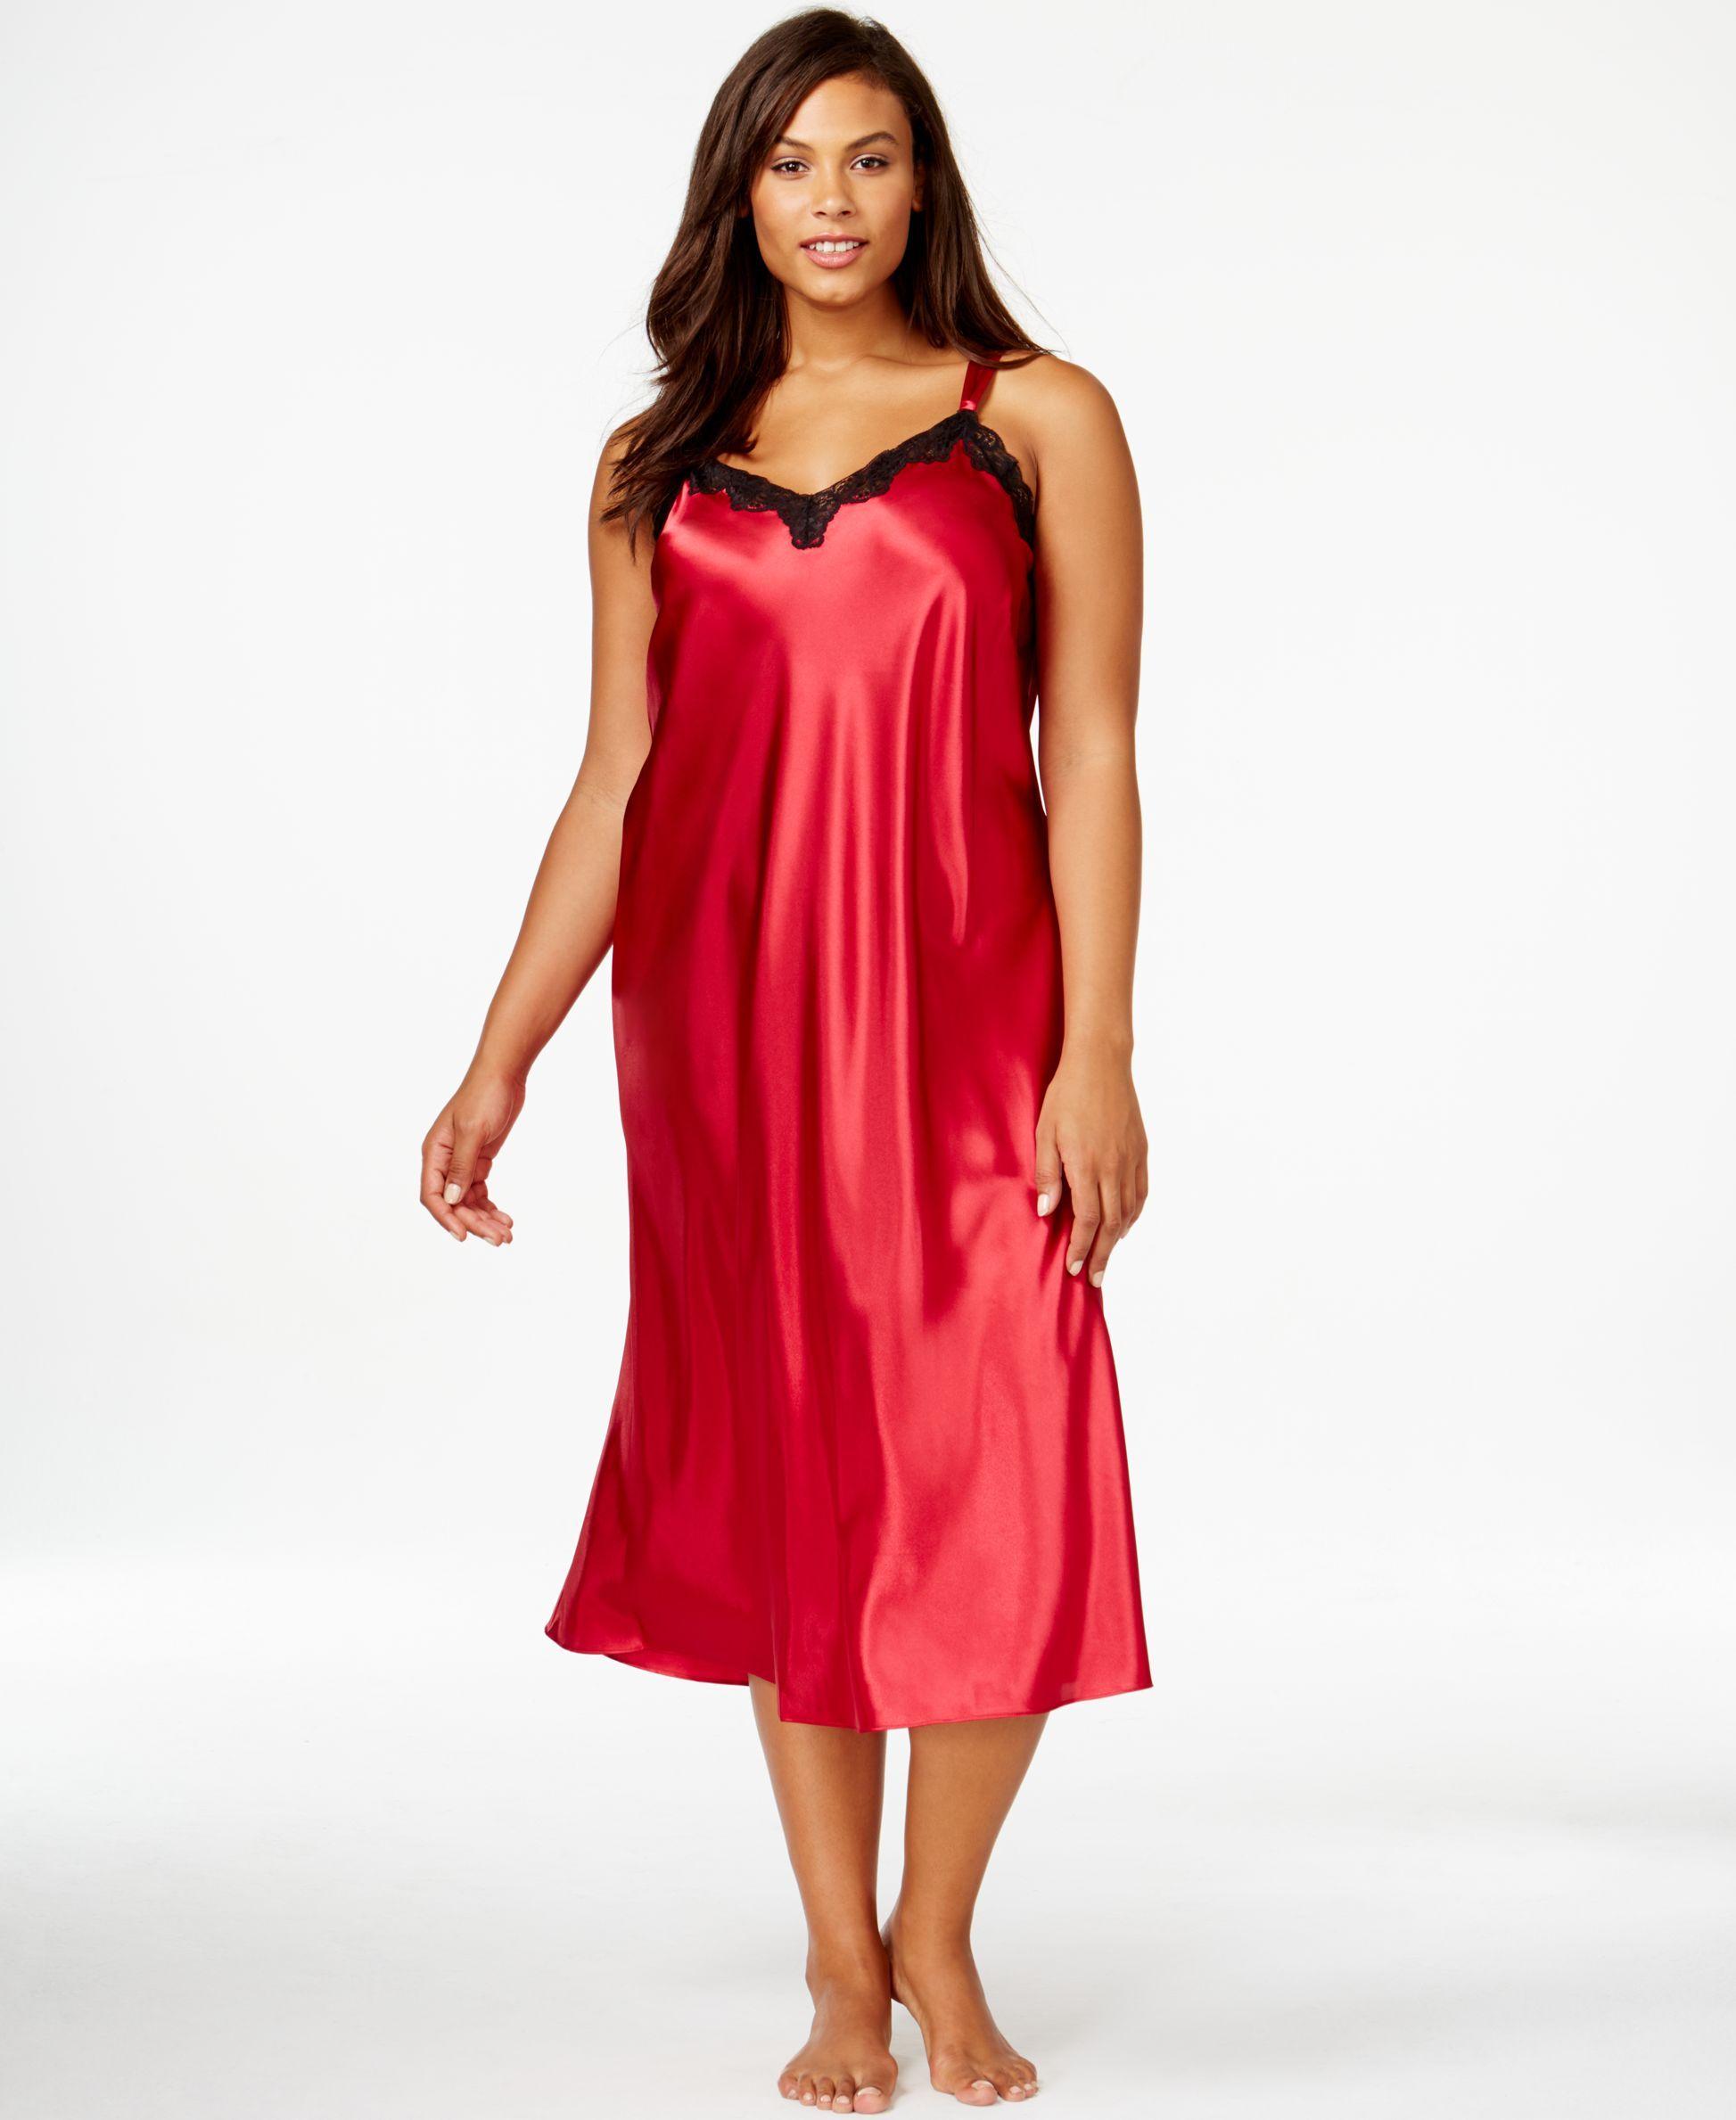 8afd23410 Morgan Taylor Plus Size Satin Nightgown Camisolas Longa